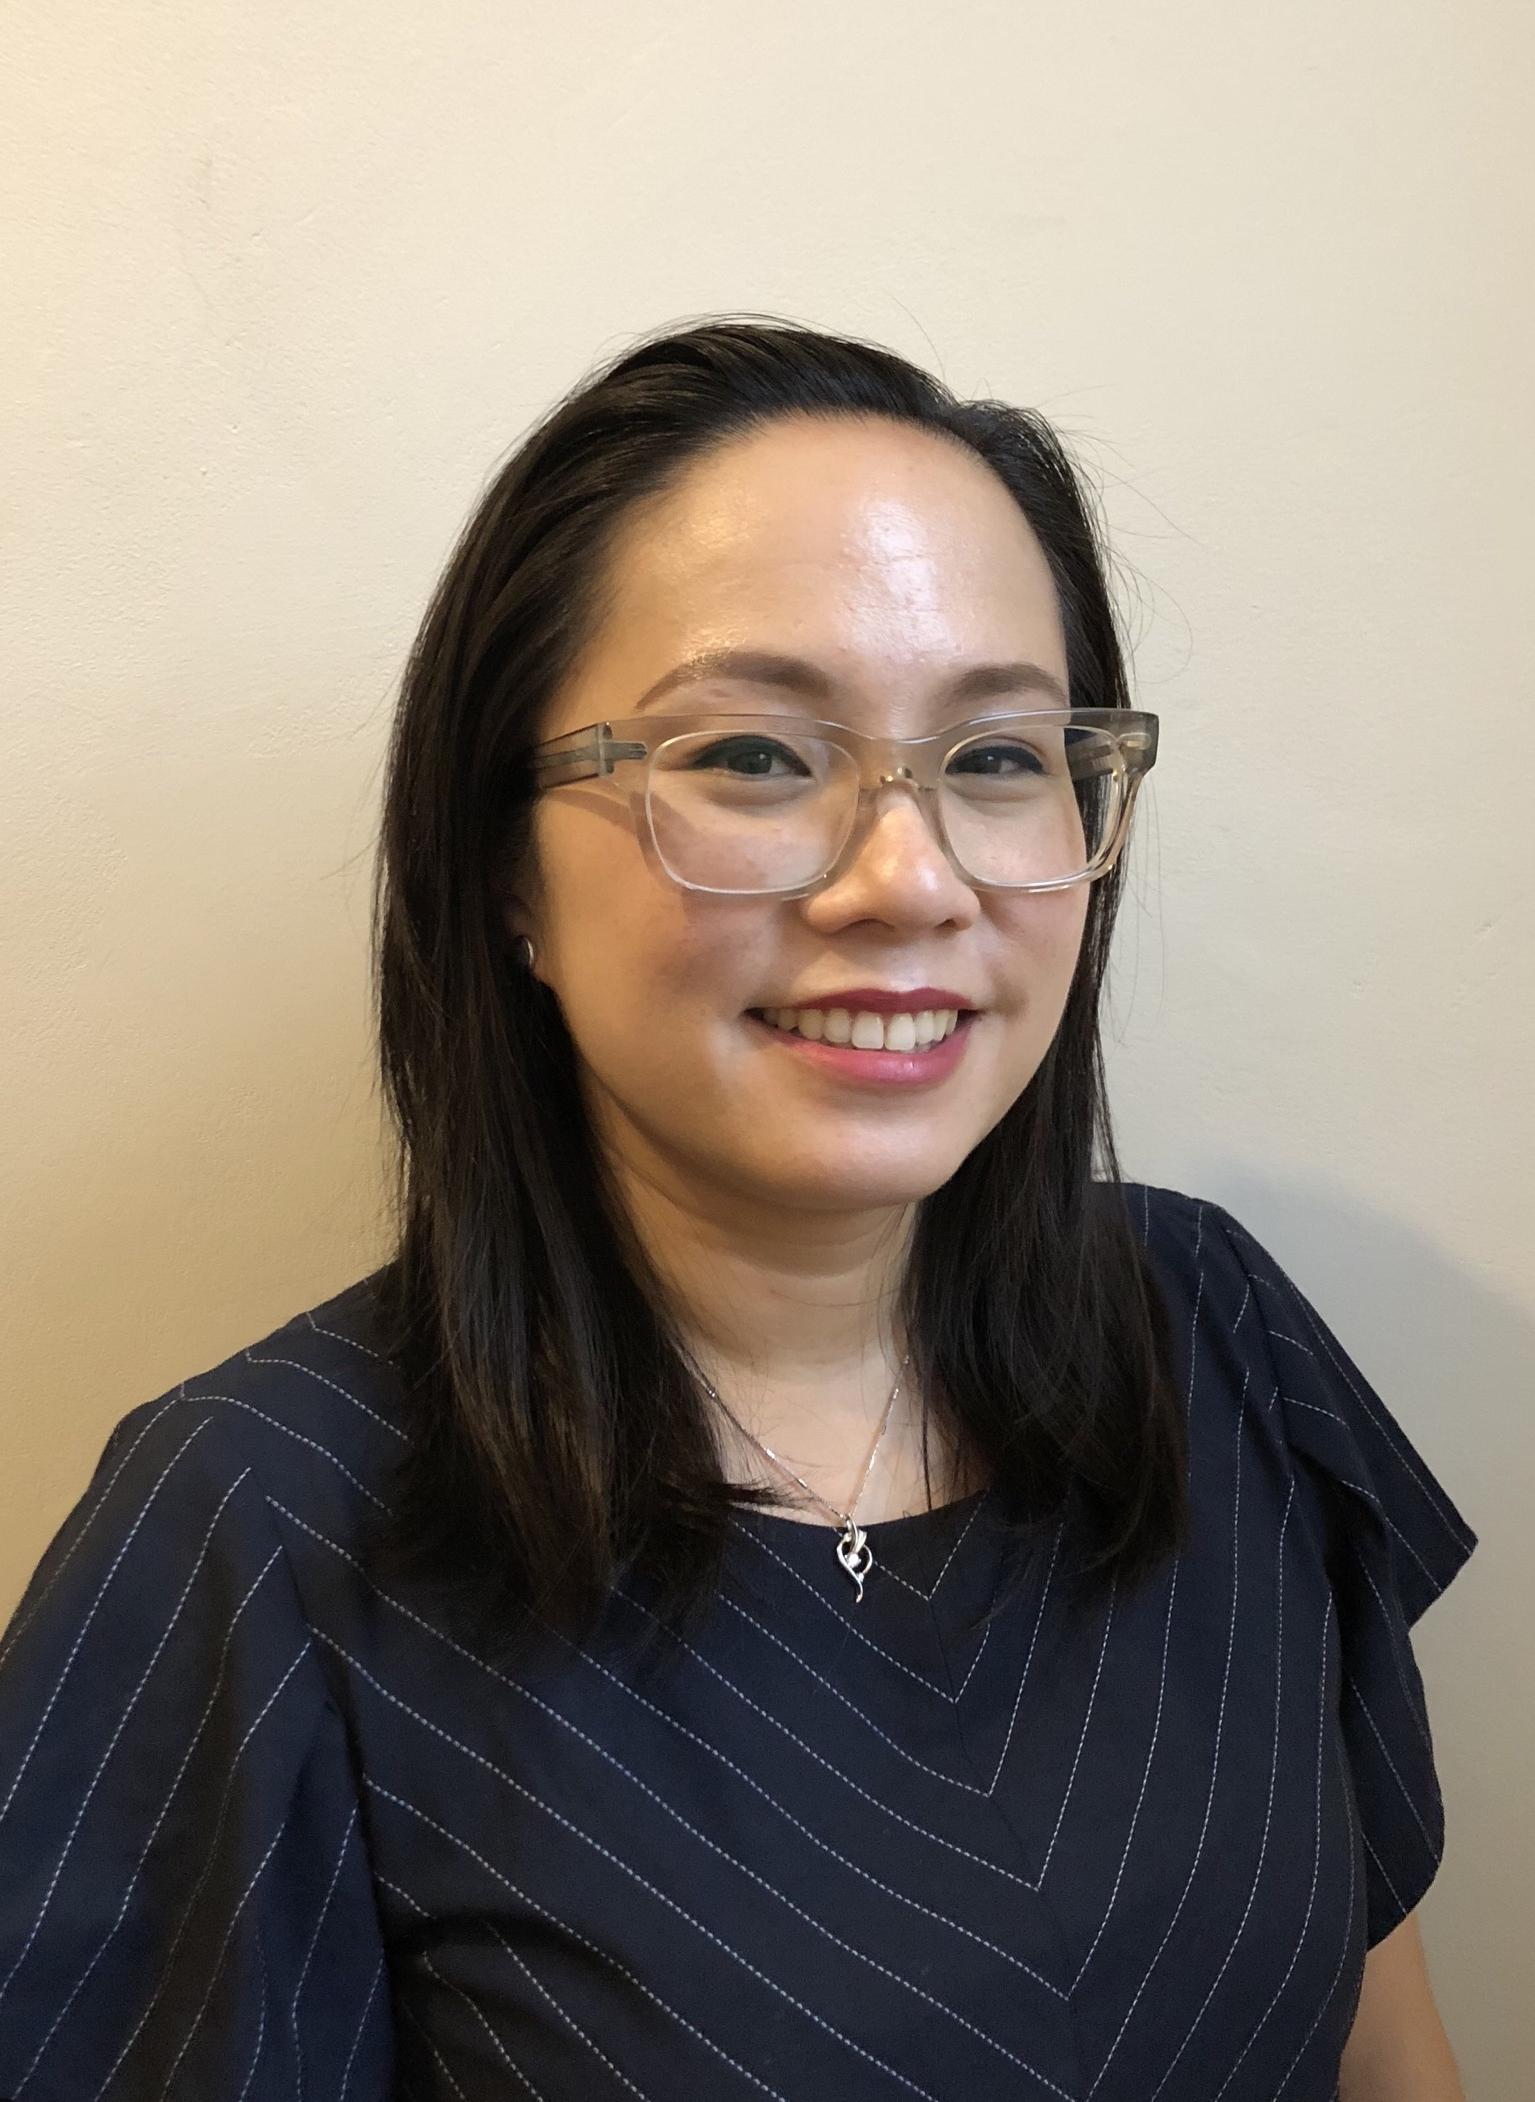 Chung Chiang, Center City Pediatrics